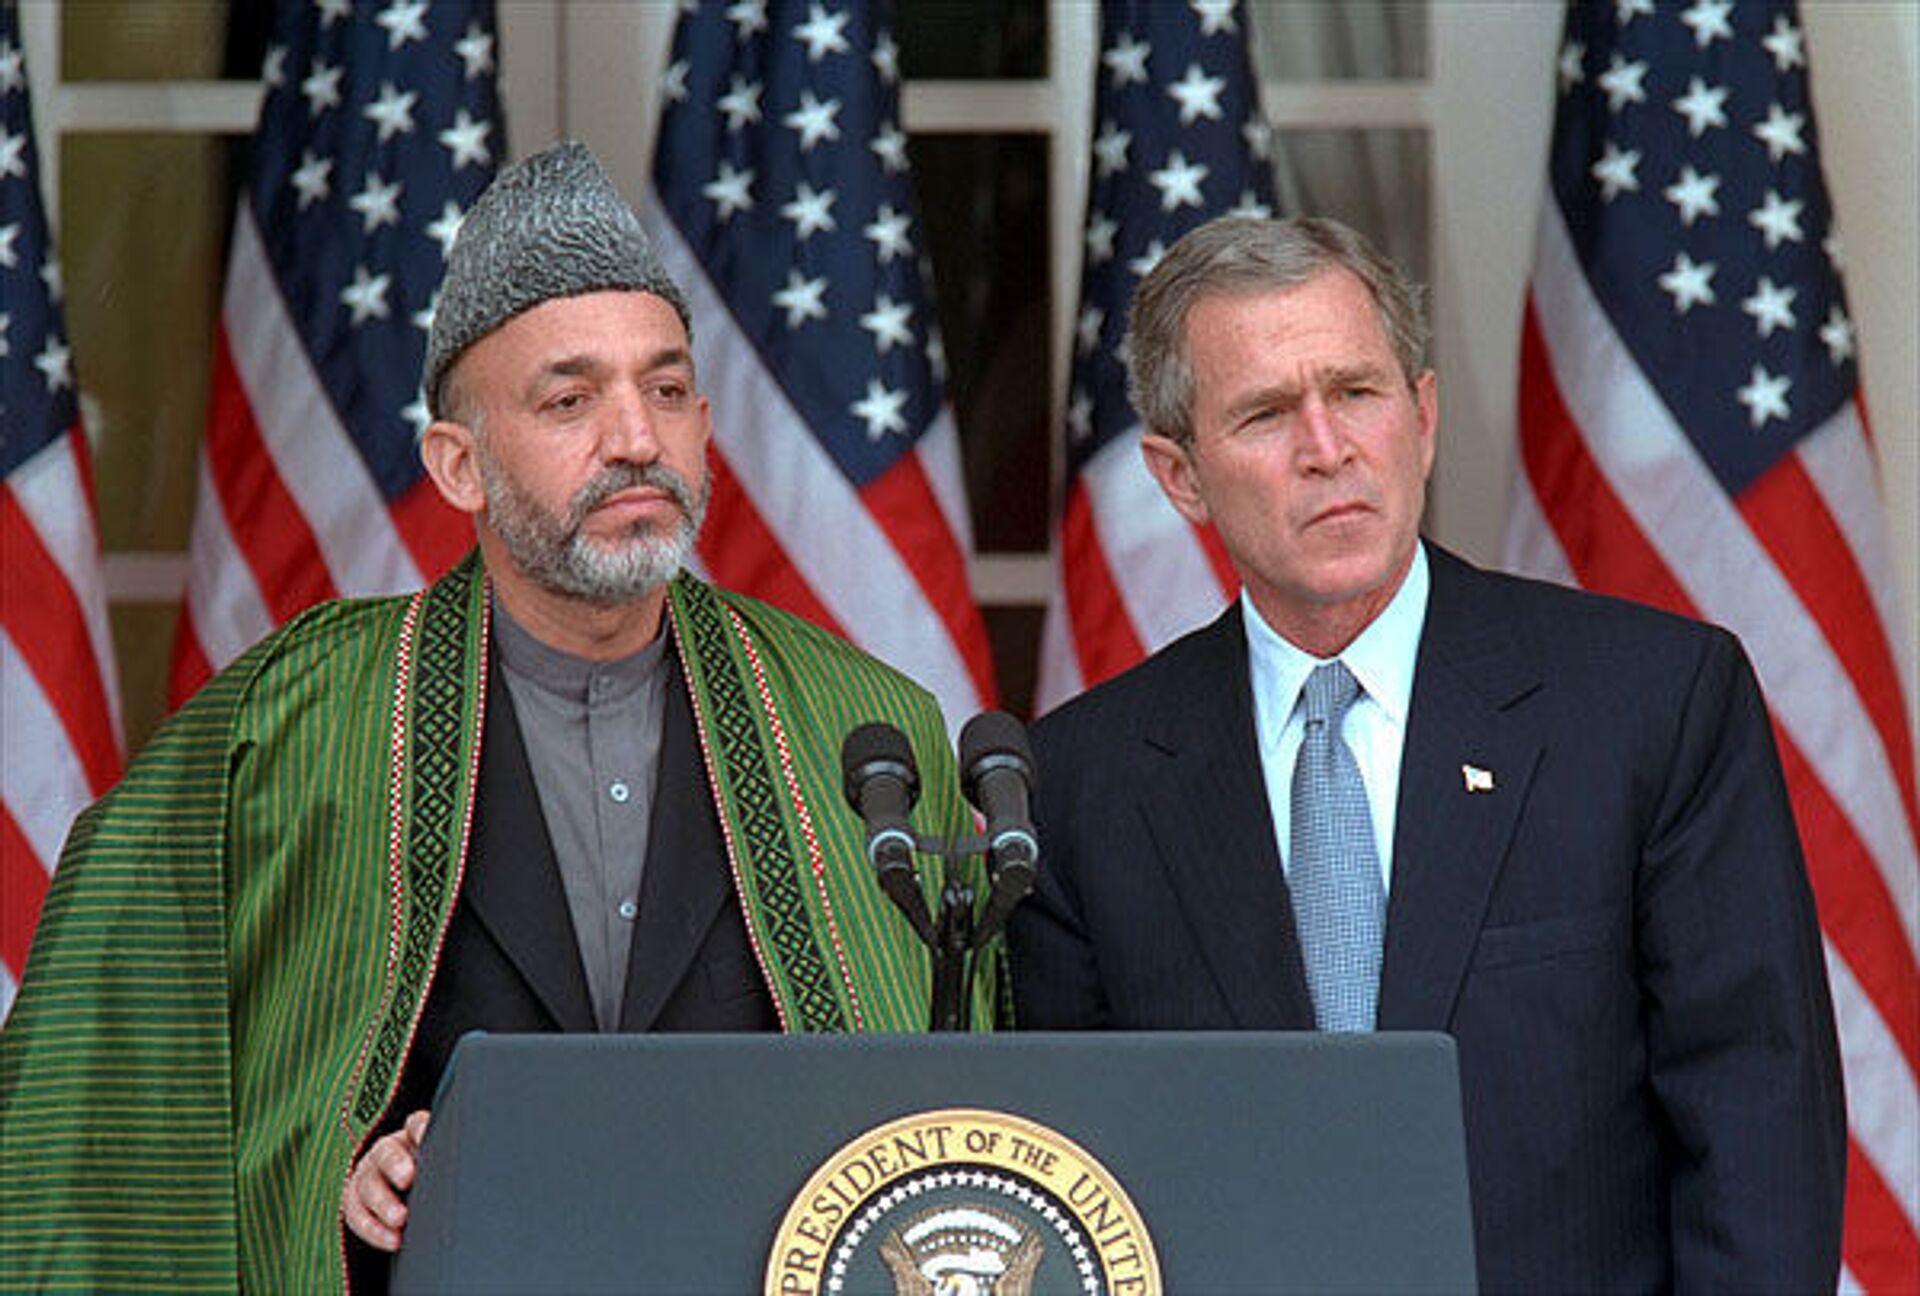 Afghan Interim President Hamid Karzai and US President George W. Bush at a press conference in 2002 - Sputnik International, 1920, 07.09.2021